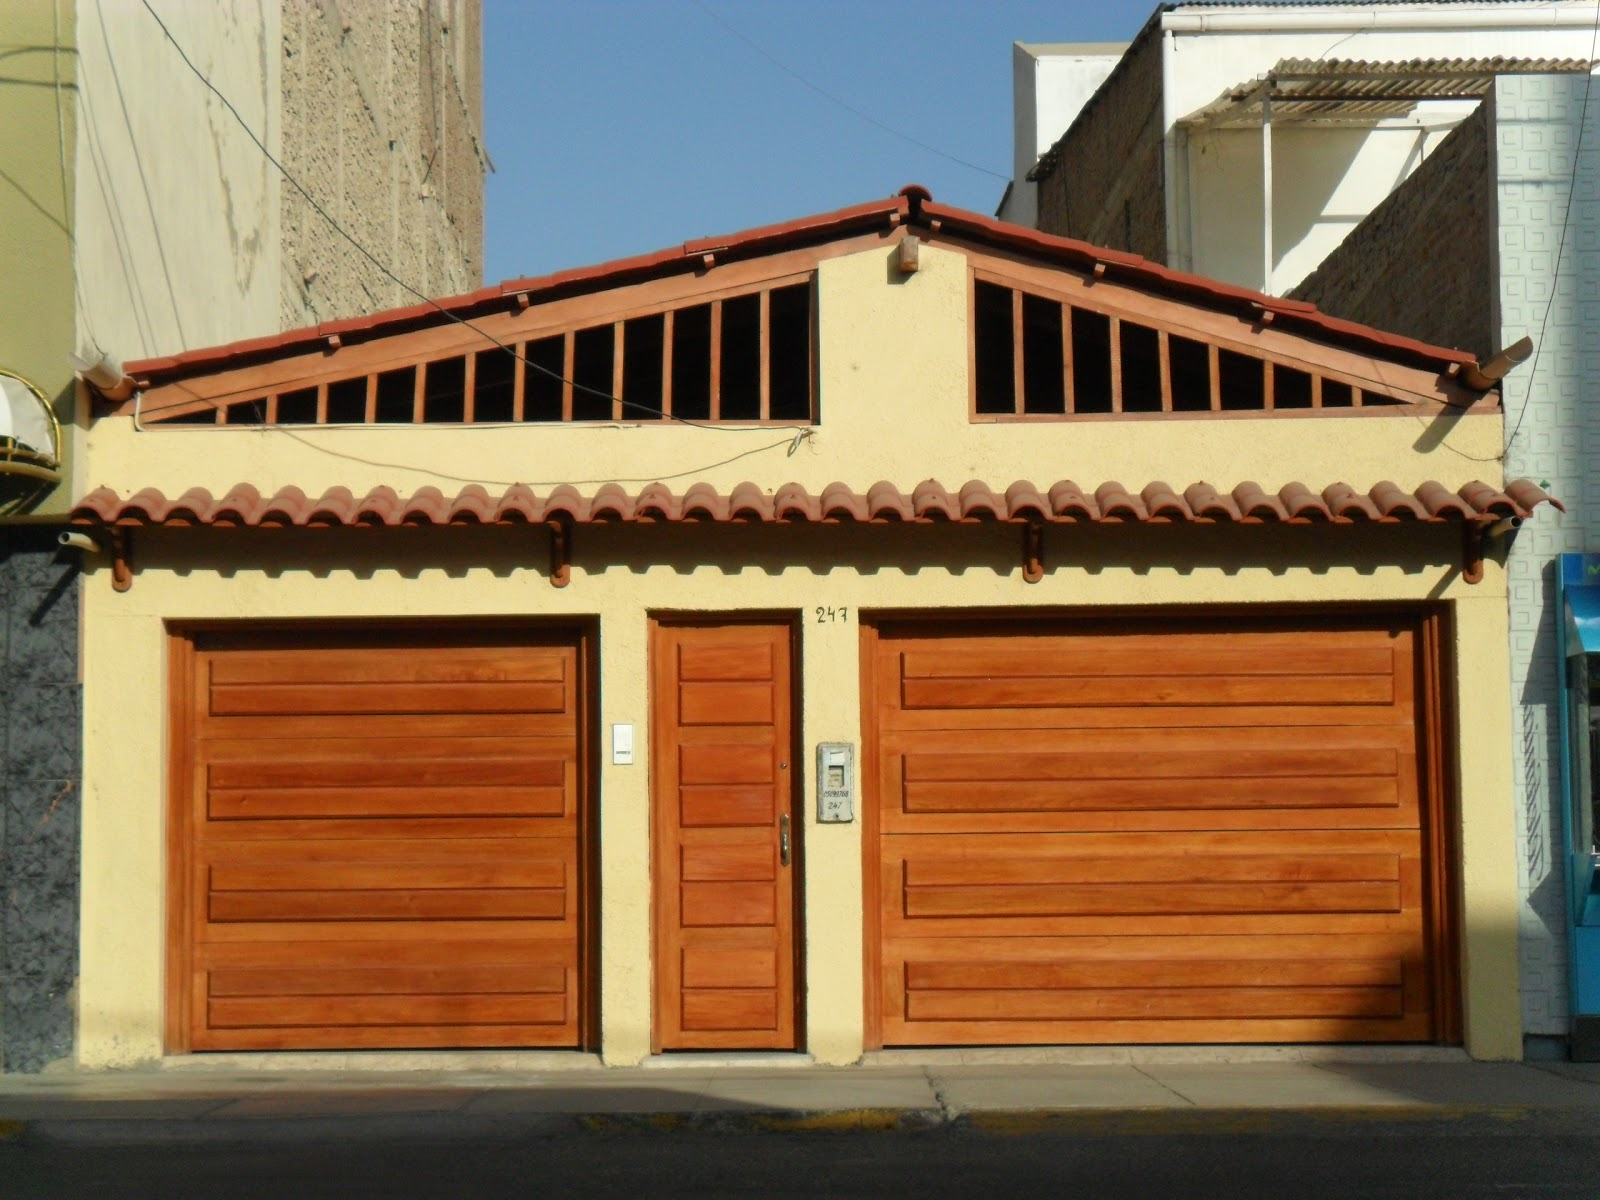 Fachadas y casas fachadas de casas de 1 piso for Modelos de techos para cocheras